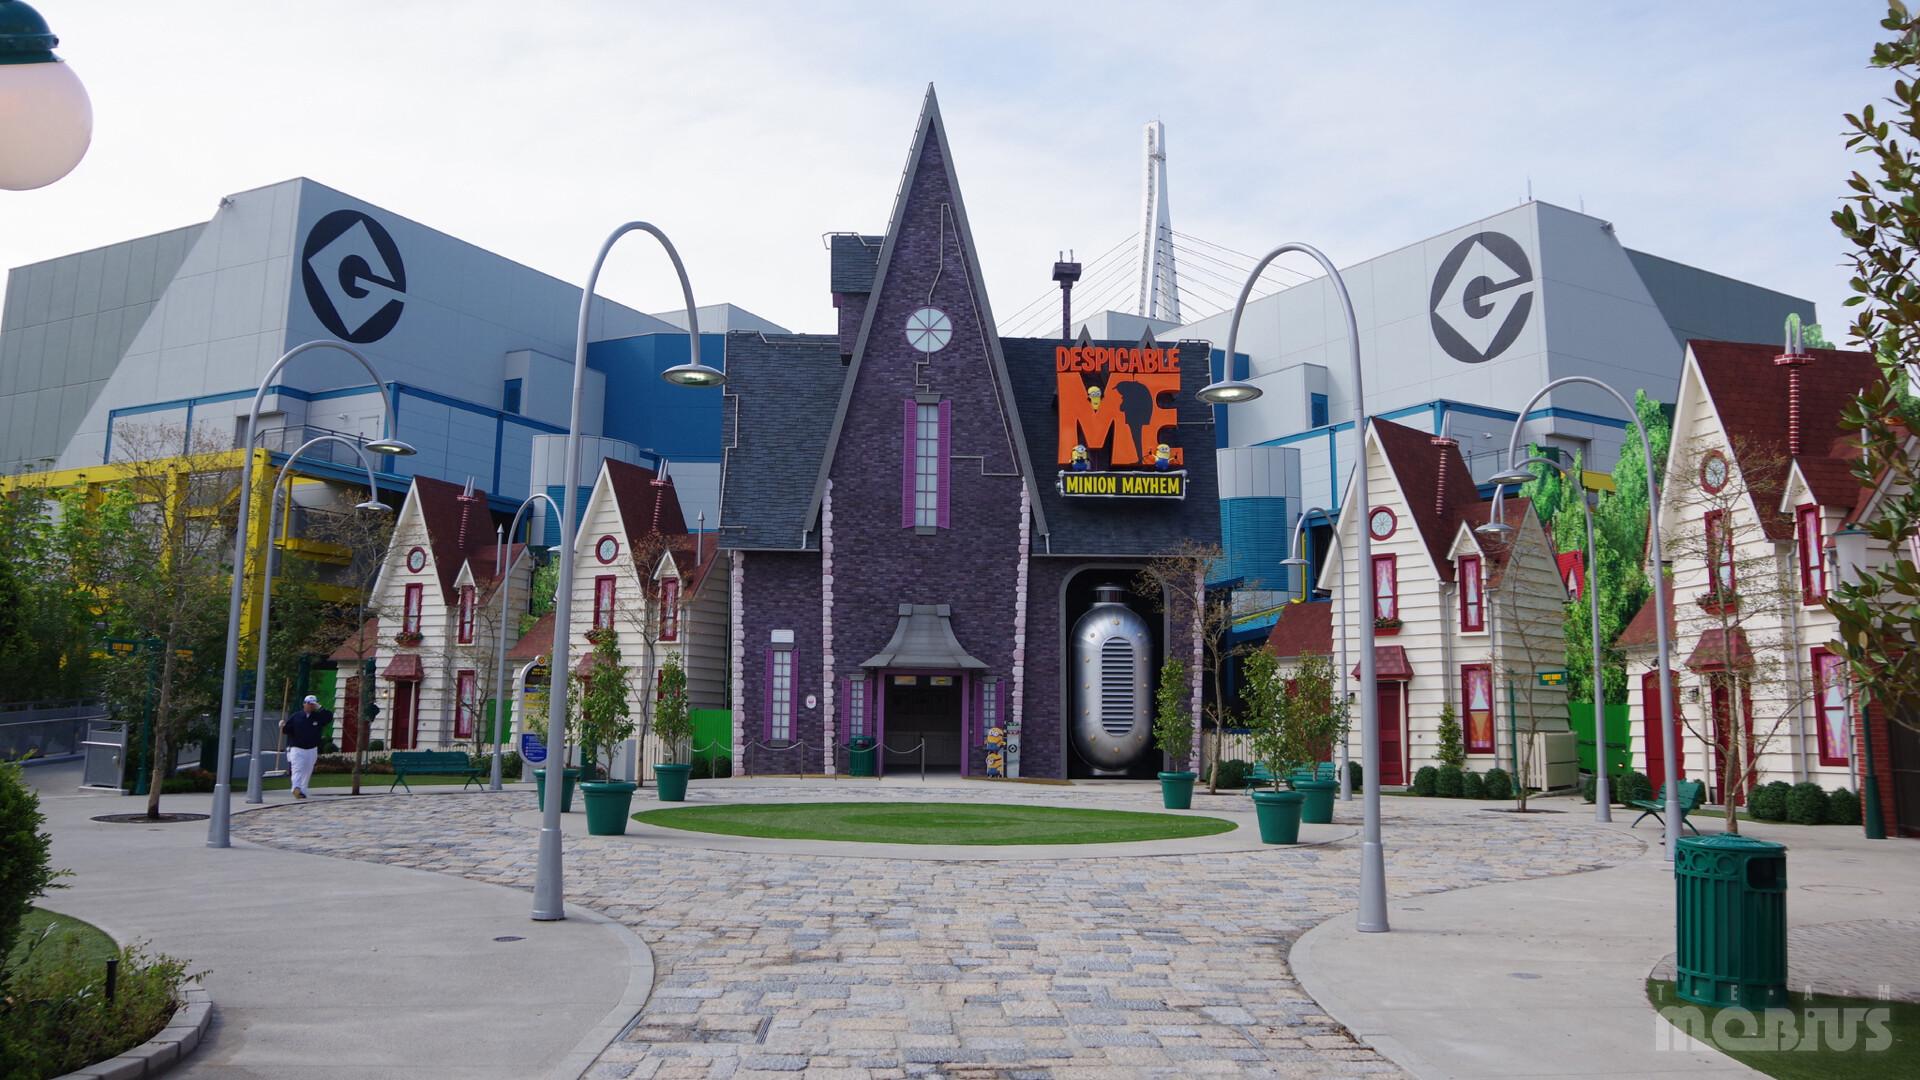 team M O B I U S - Universal Studios Japan: Despicable Me; Minion Mayhem &  Minion Park